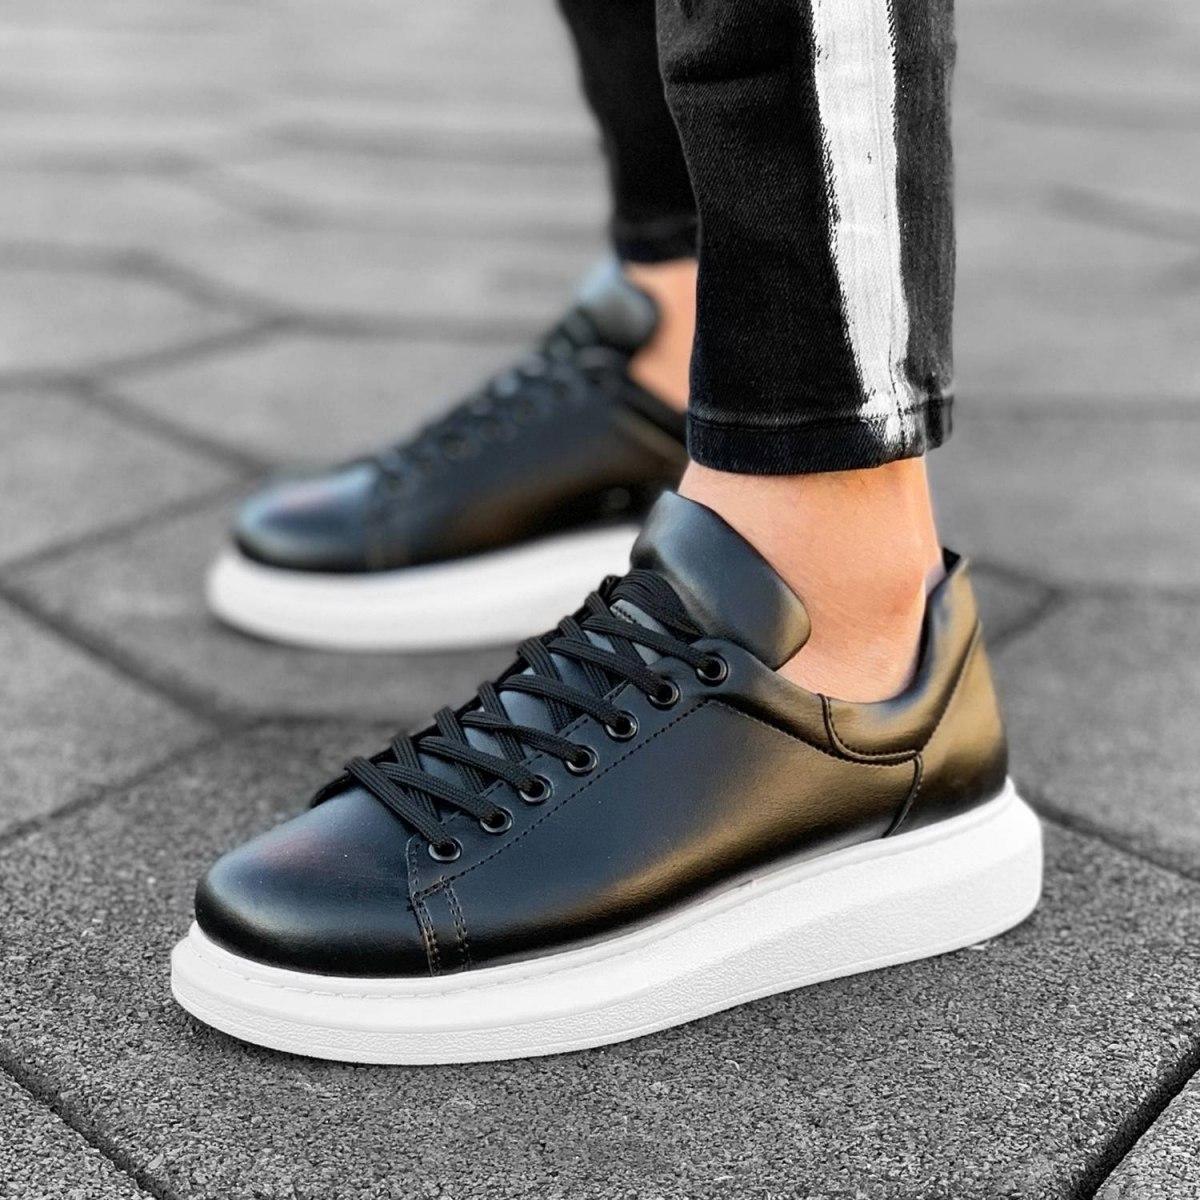 MV Mega Sole in Matte Black&White Sneaker